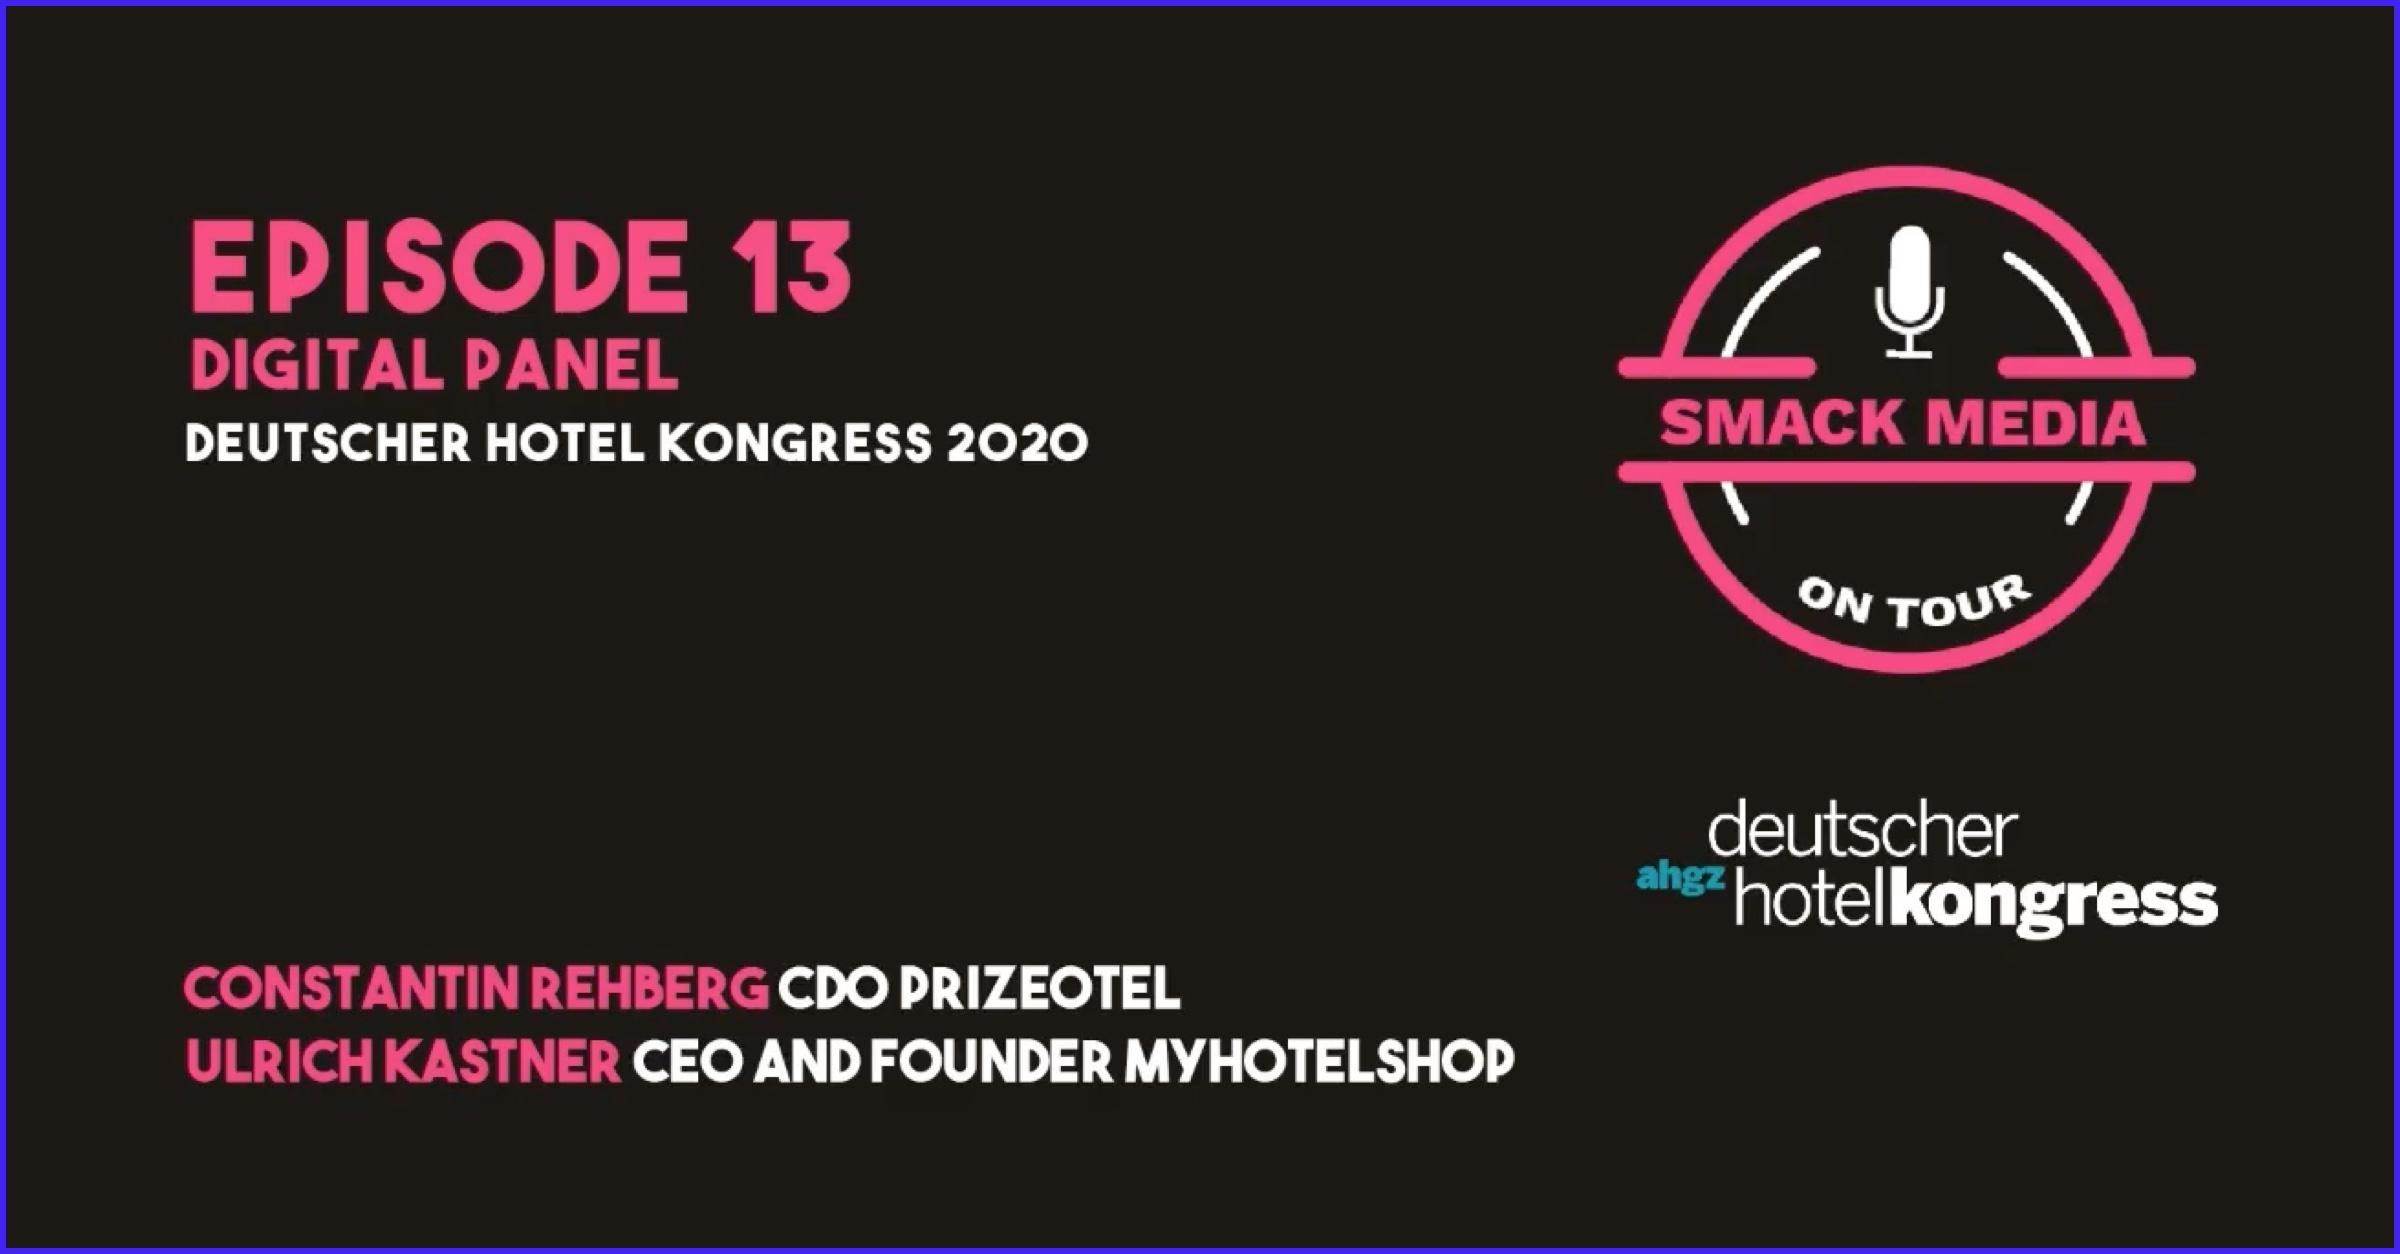 SMACK #13 ON TOUR - Digital Panel @ Deutscher Hotelkongress